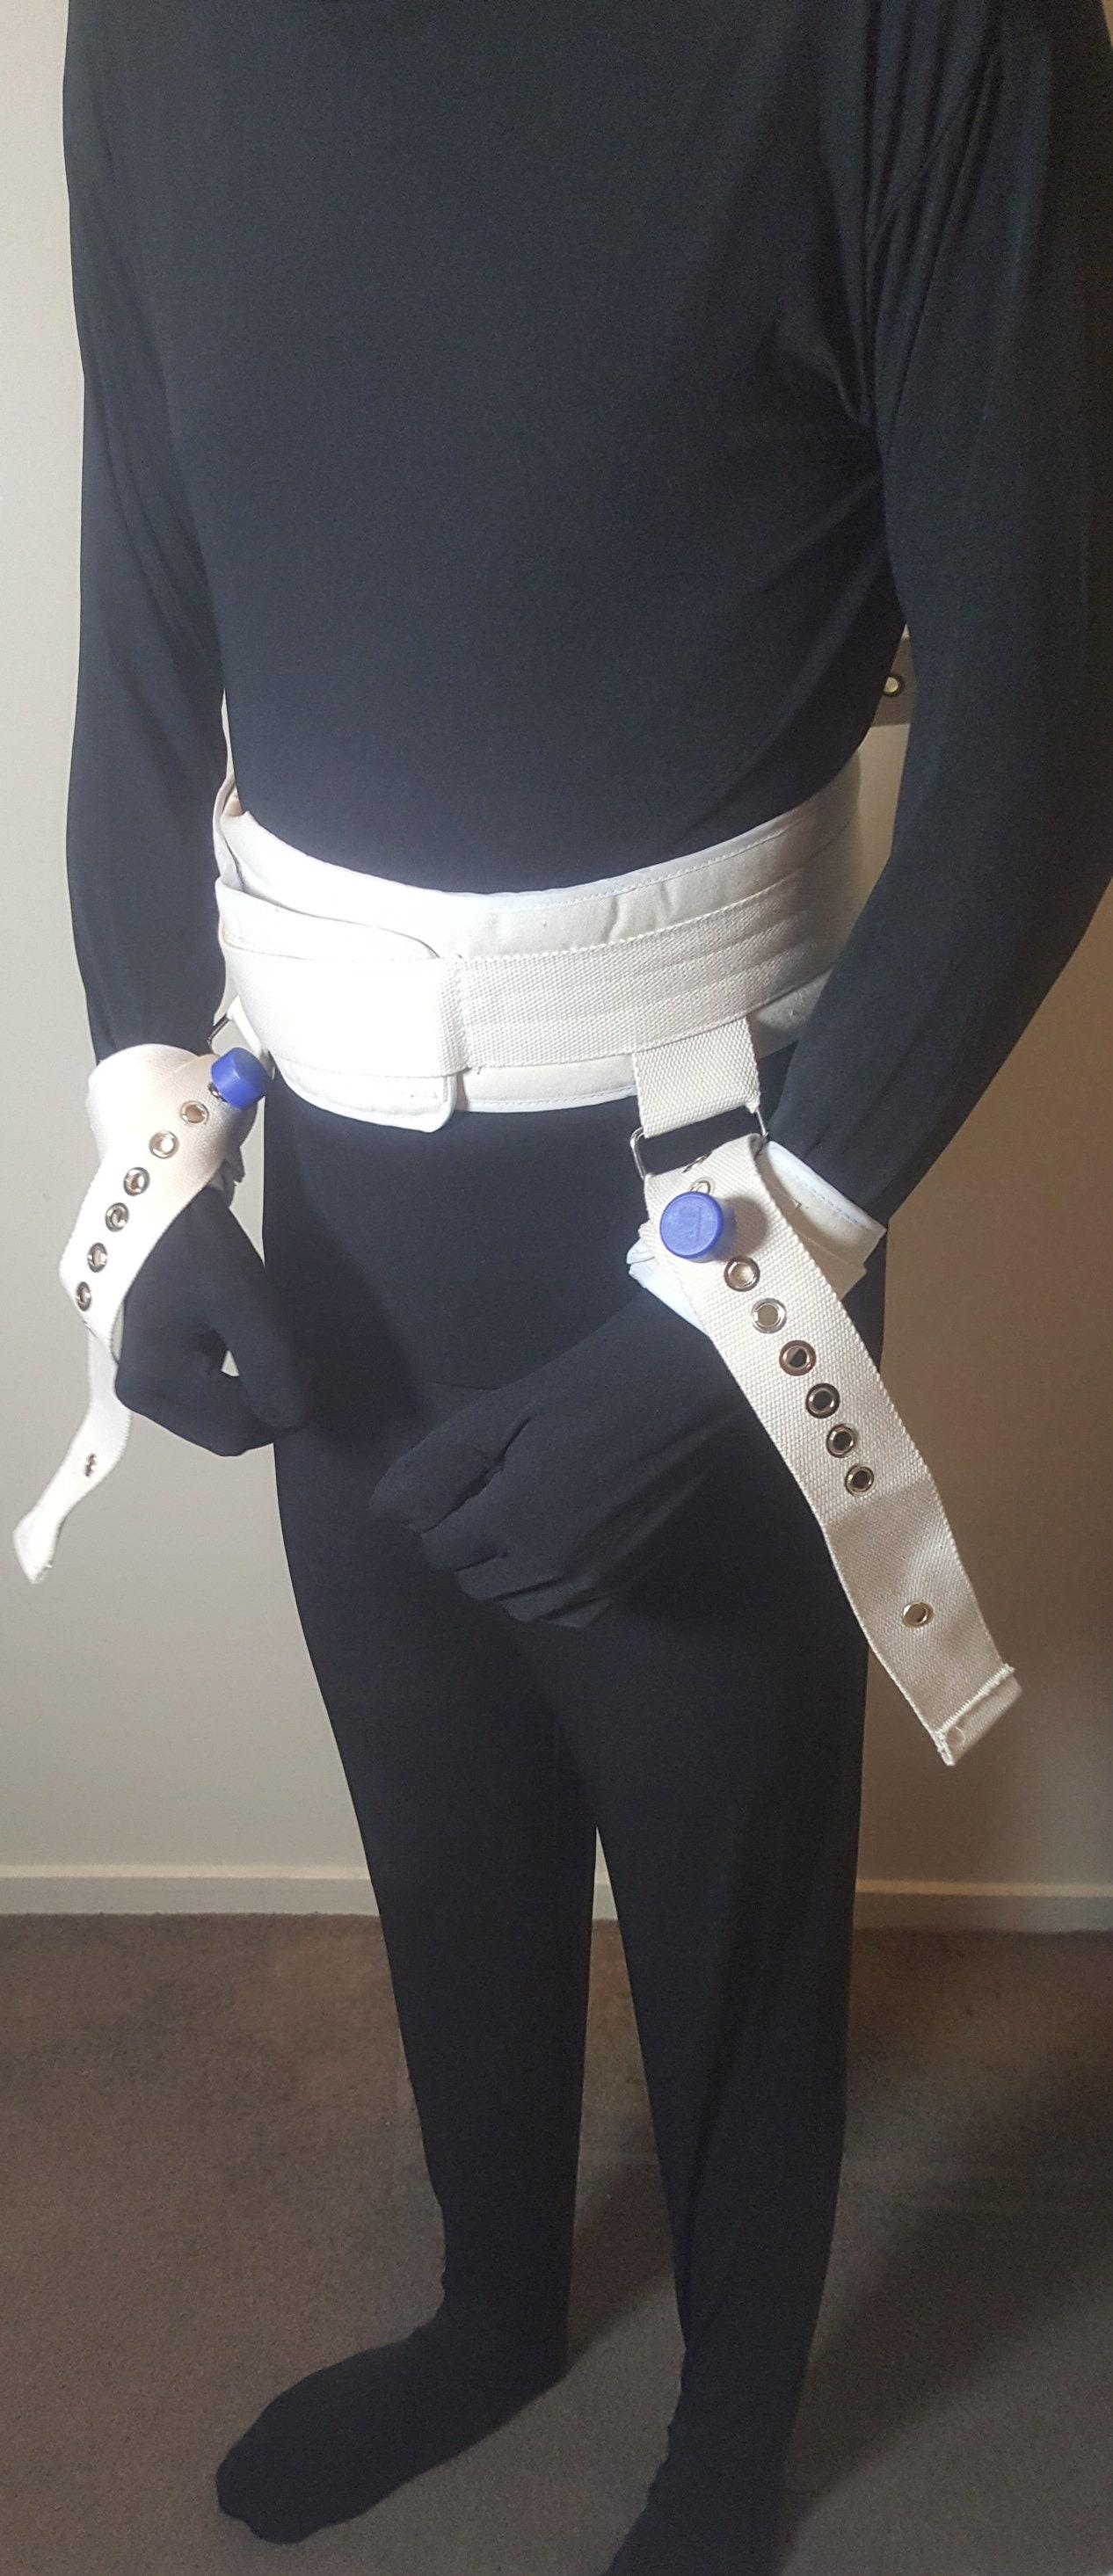 Waist Restraint Adult Baby Segufix, Fixx Salvafix Magnetic Lock Bondage Bdsm